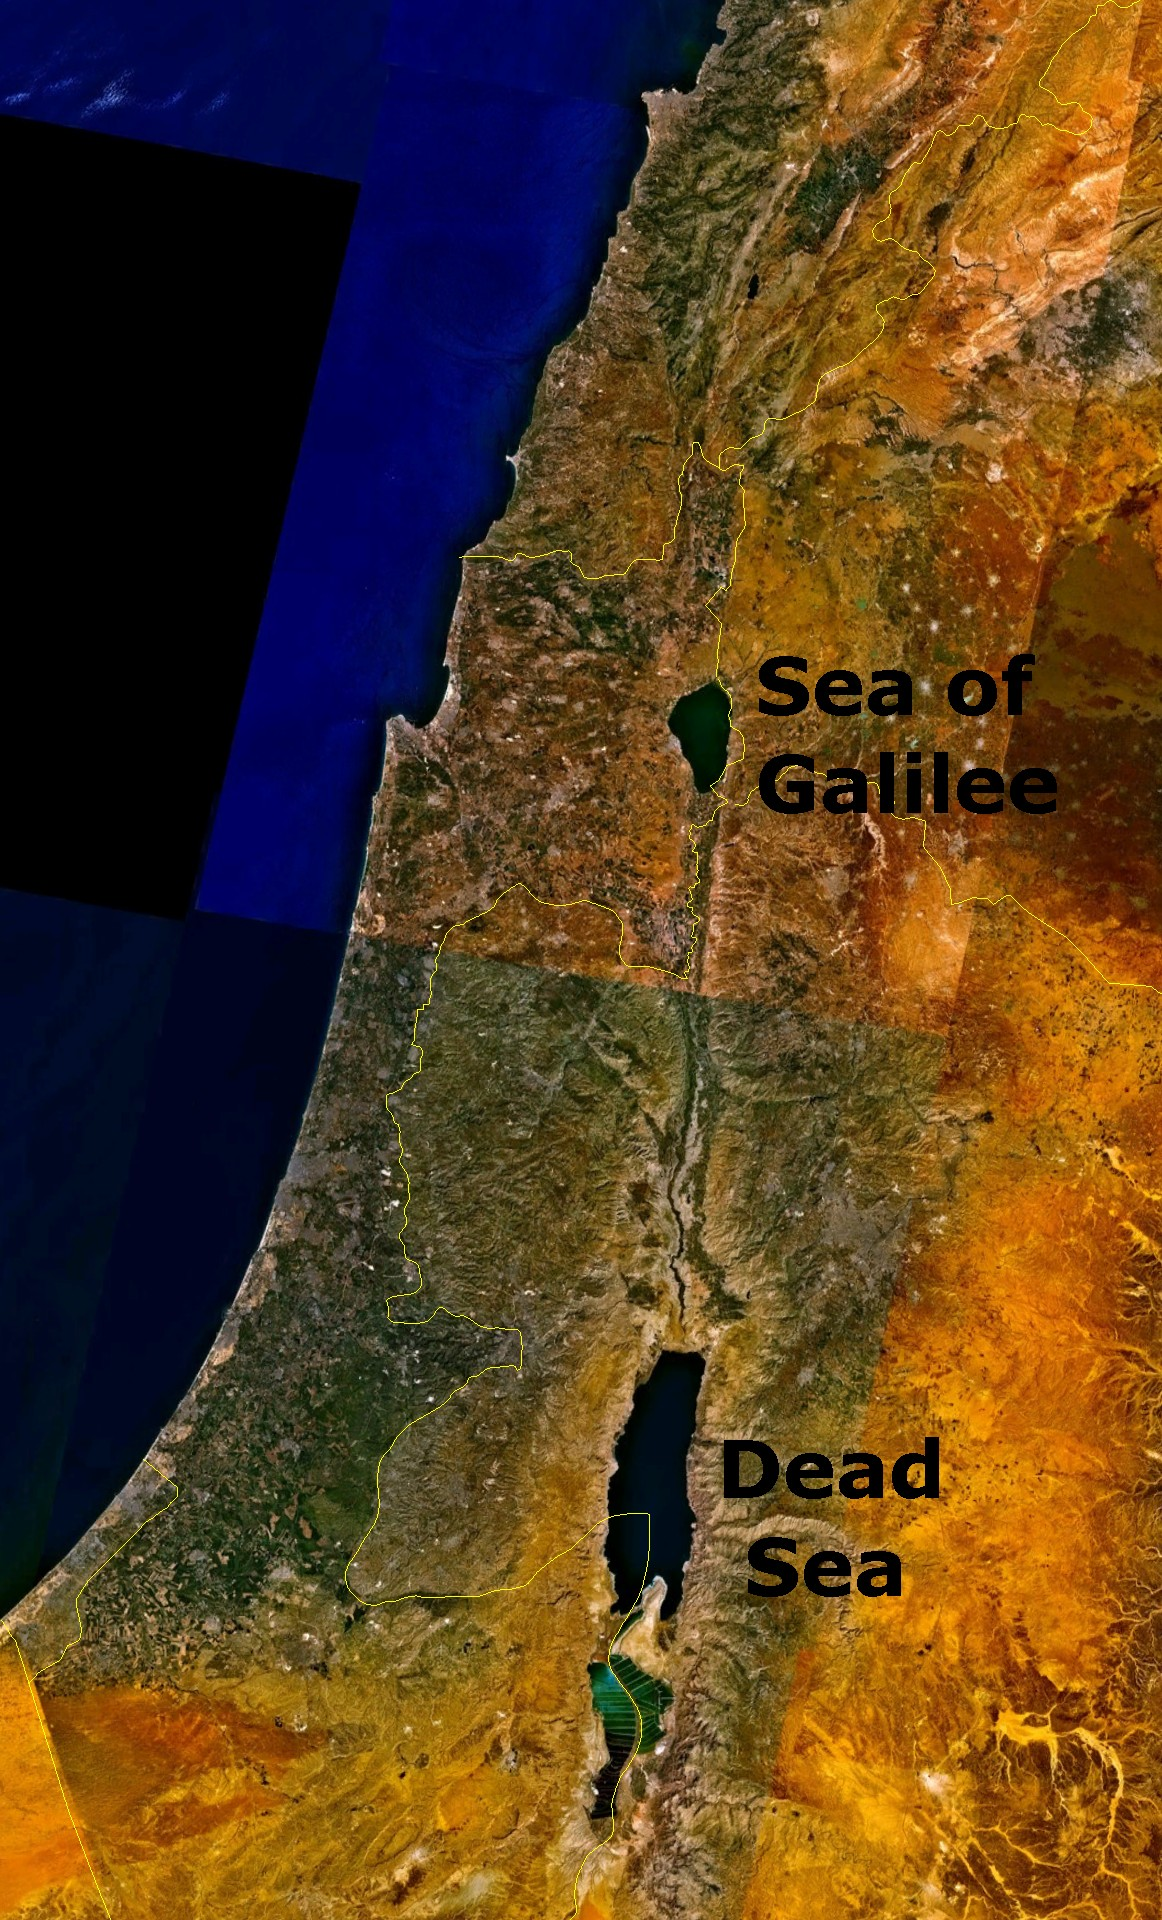 galilee-sea_dead-sea